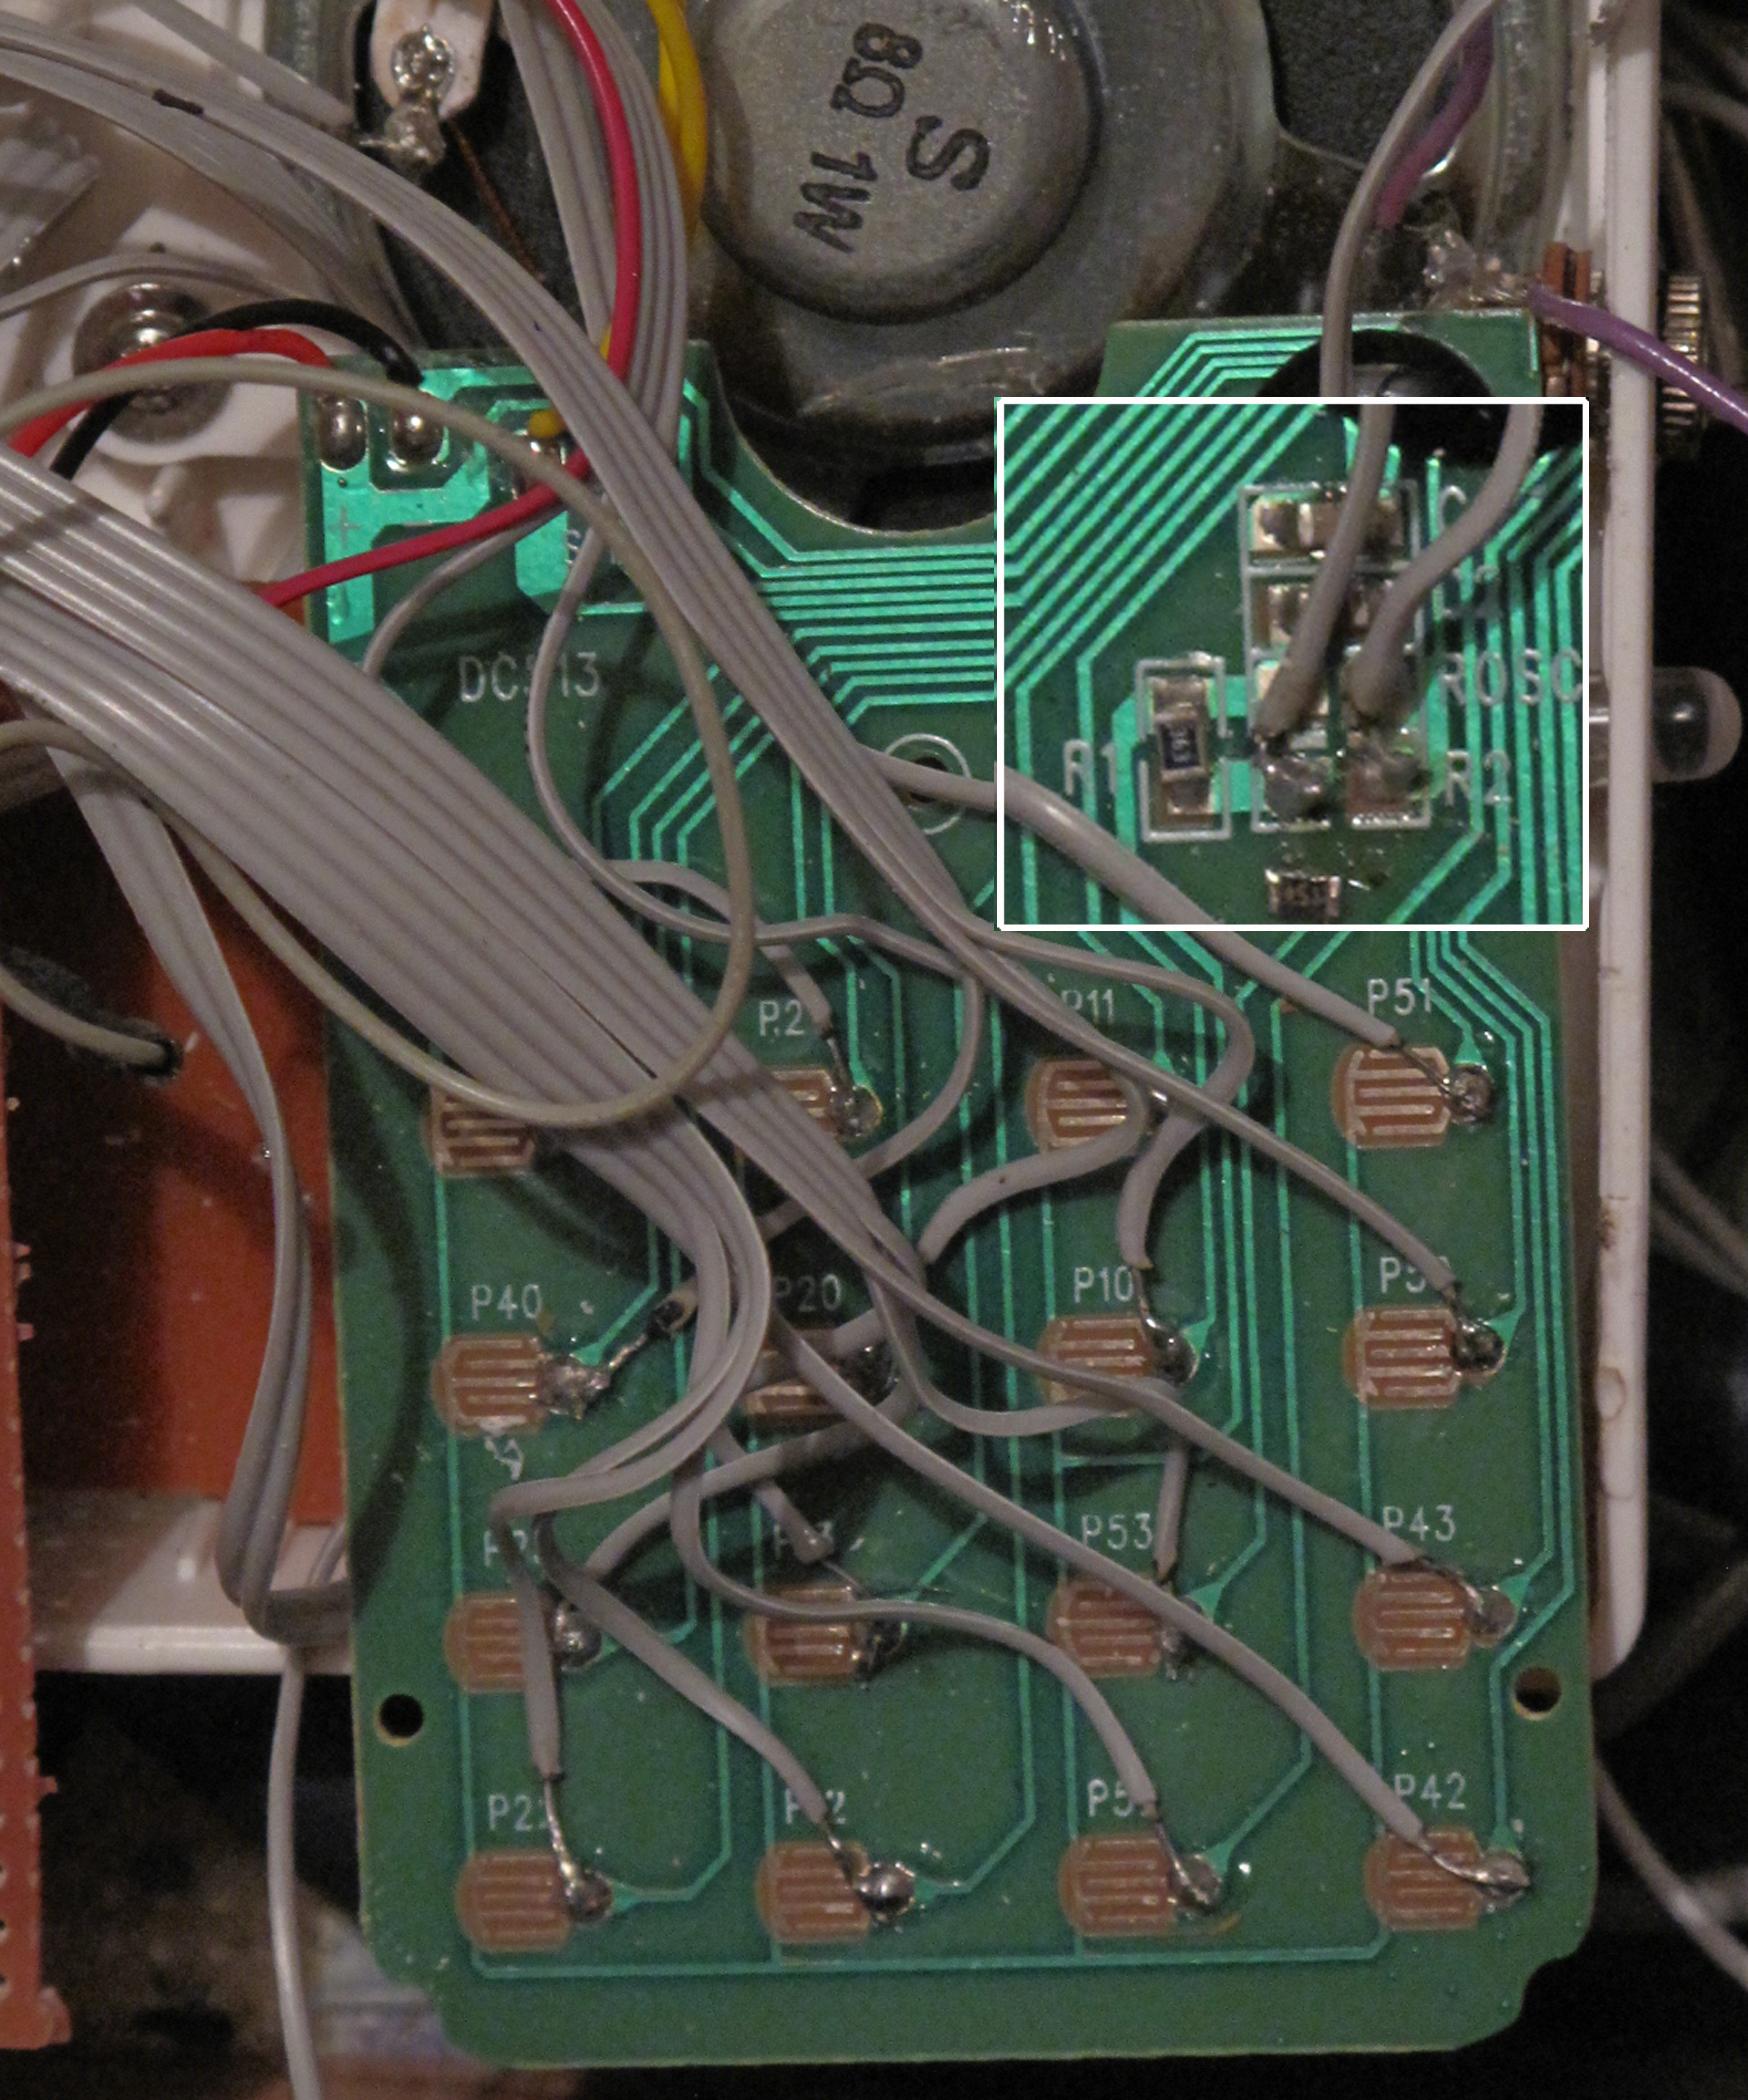 Circuit Bending Music Electronics Printing Machine Prices Buy Board Machinecircuit Smachine Pcb Img 1473